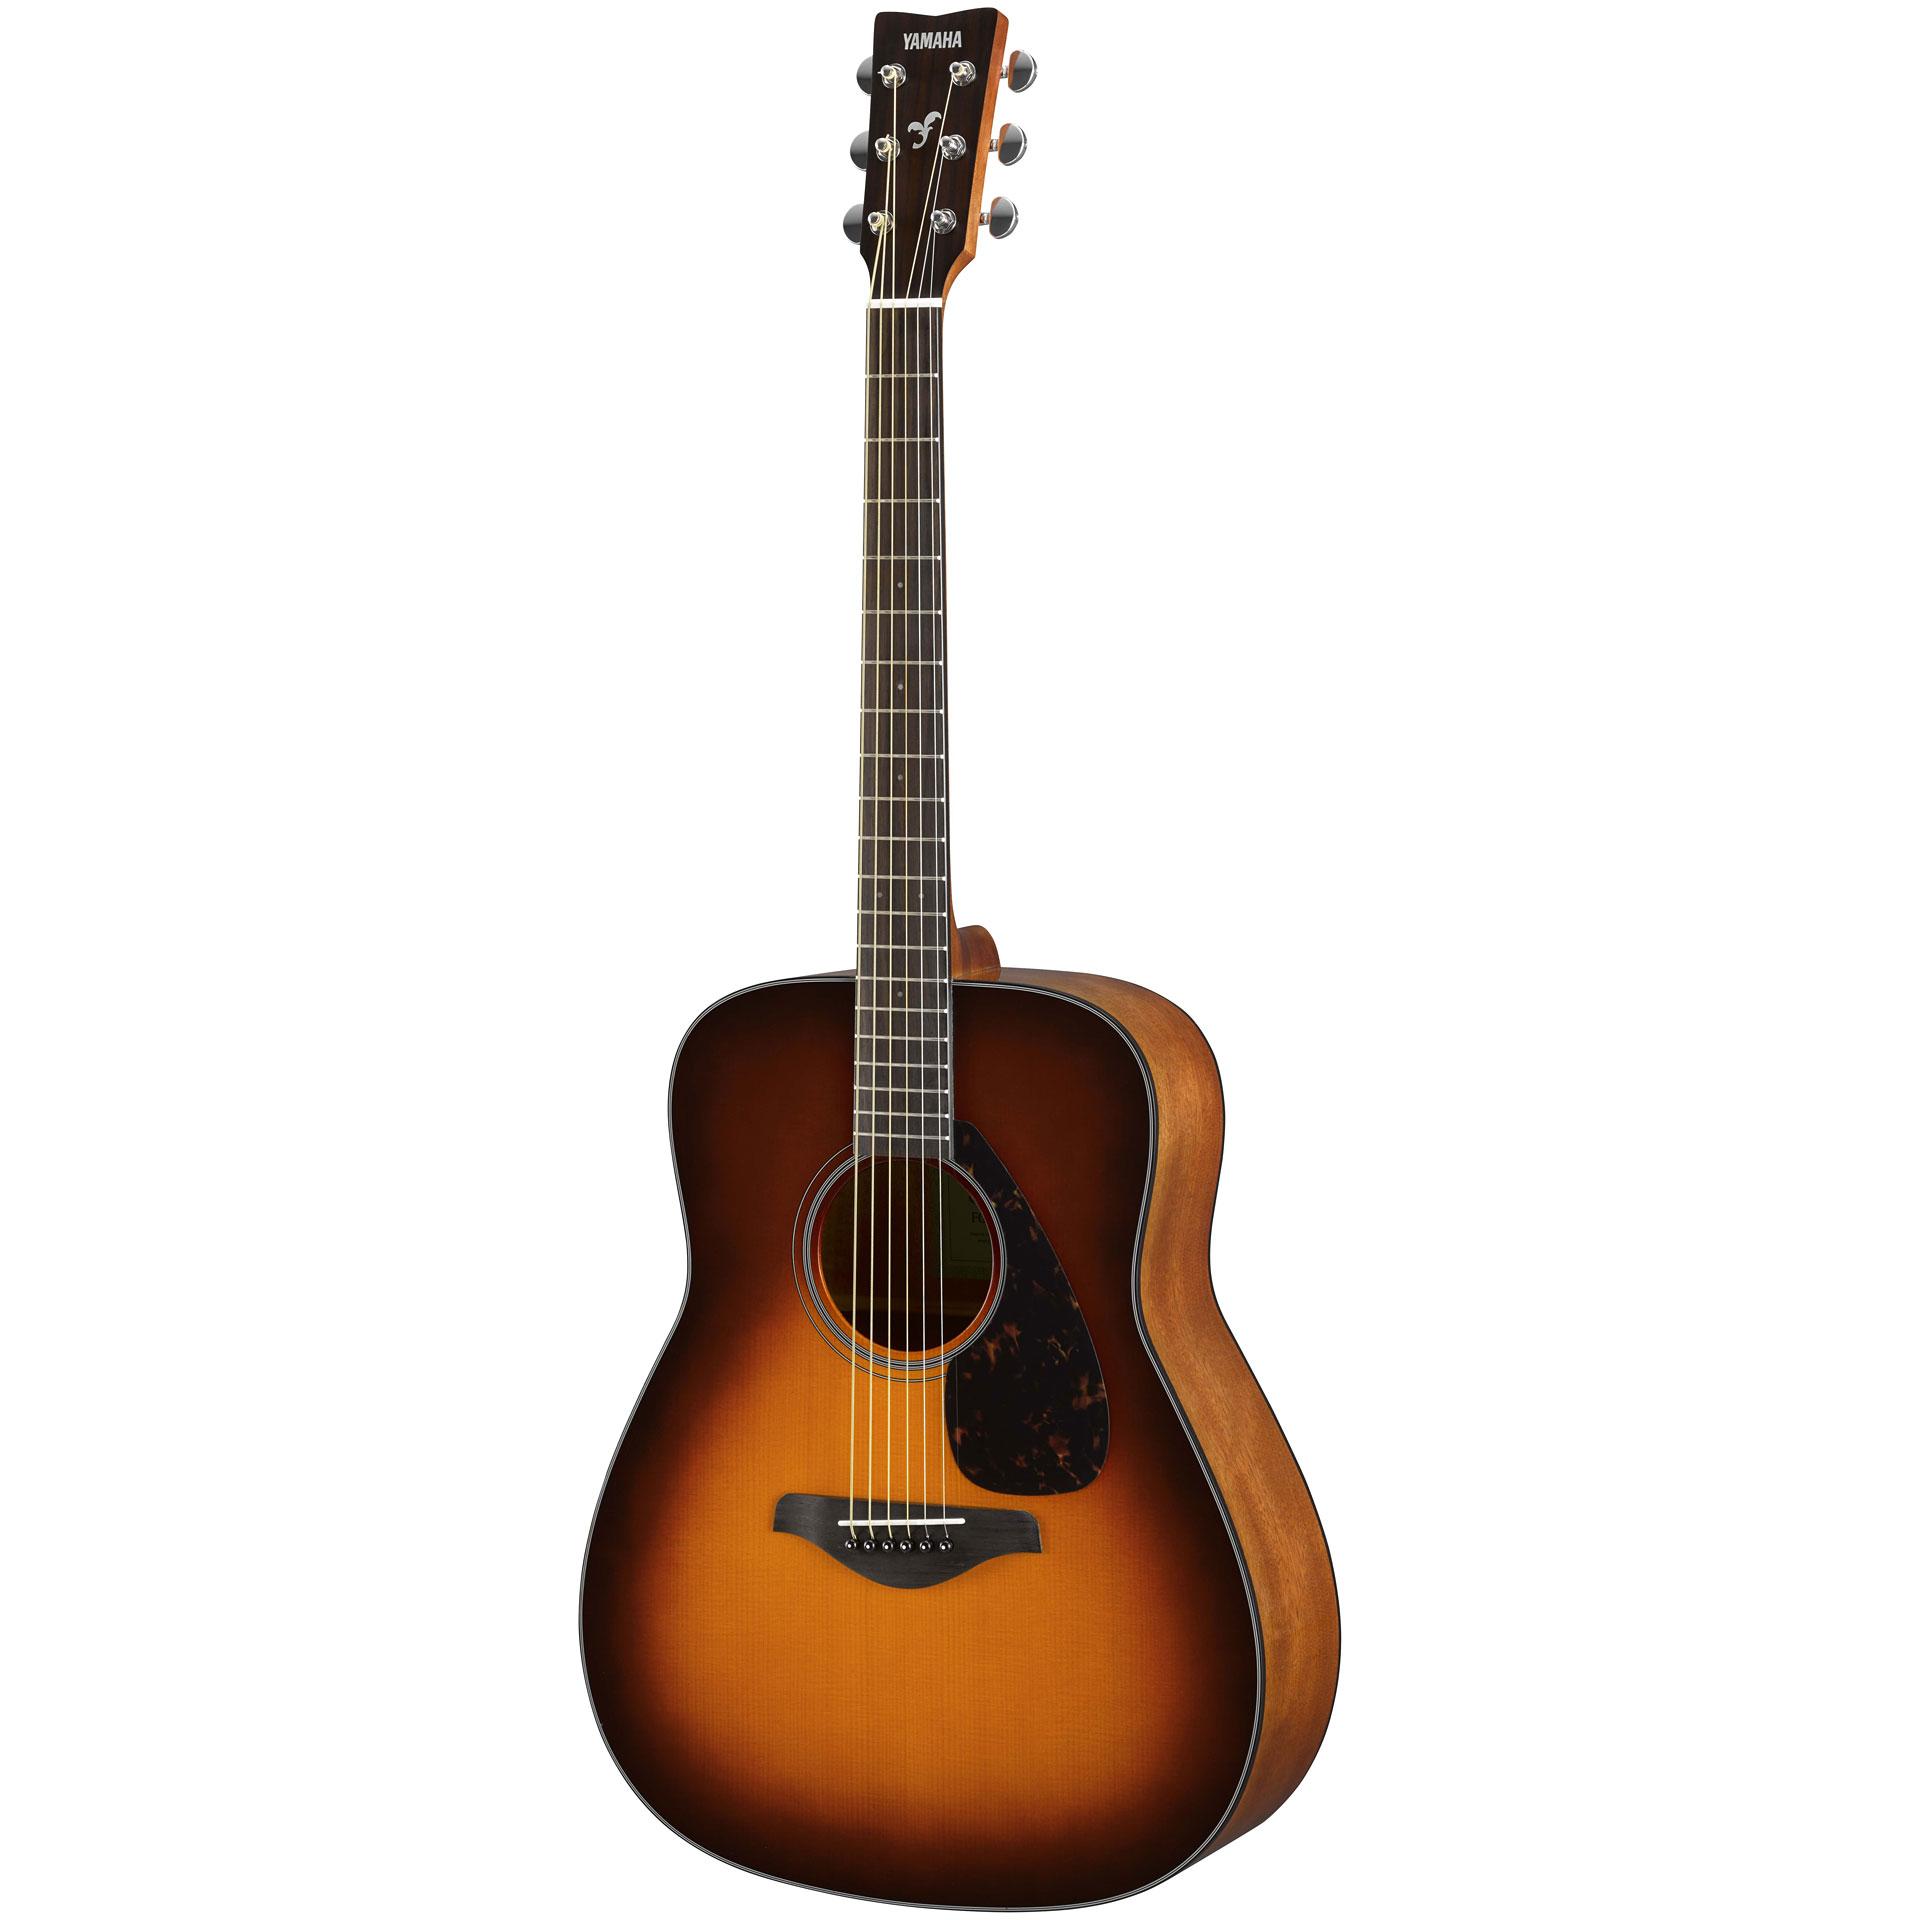 Yamaha Acoustic Guitar Fgs